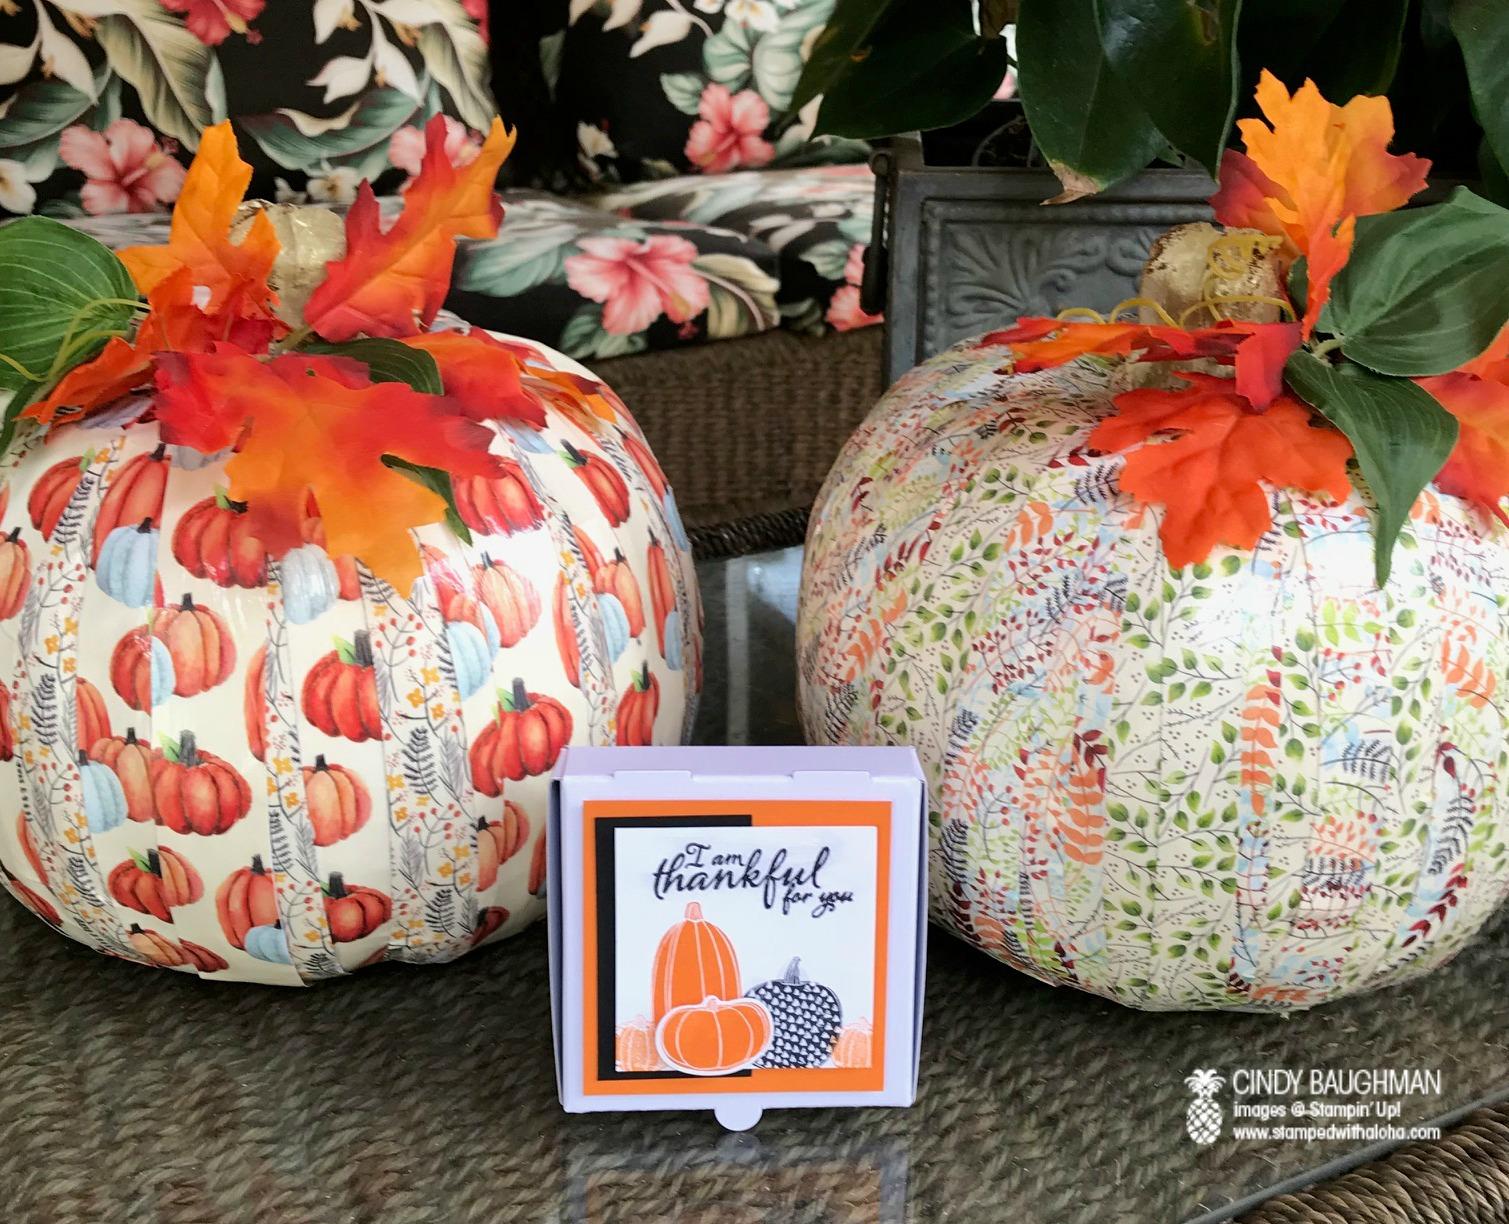 Pick A Paper Pumpkin - www.stampedwithaloha.com